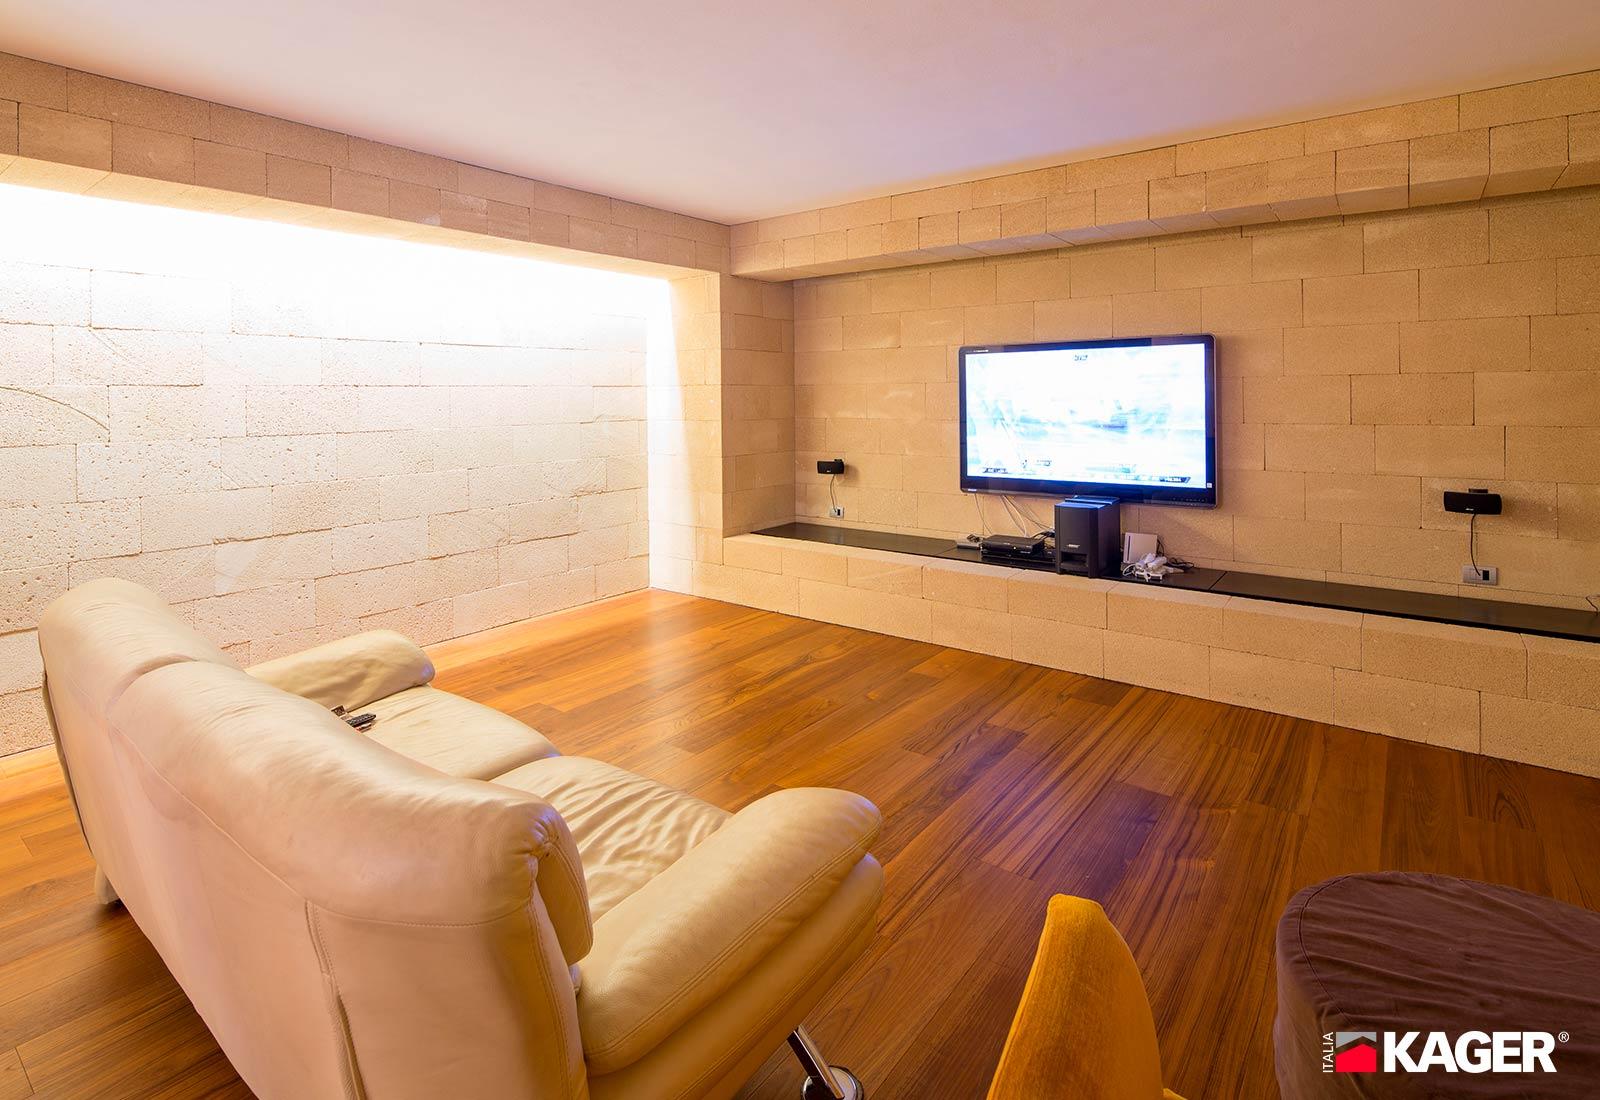 Casa-in-legno-Forli-Kager-Italia-11